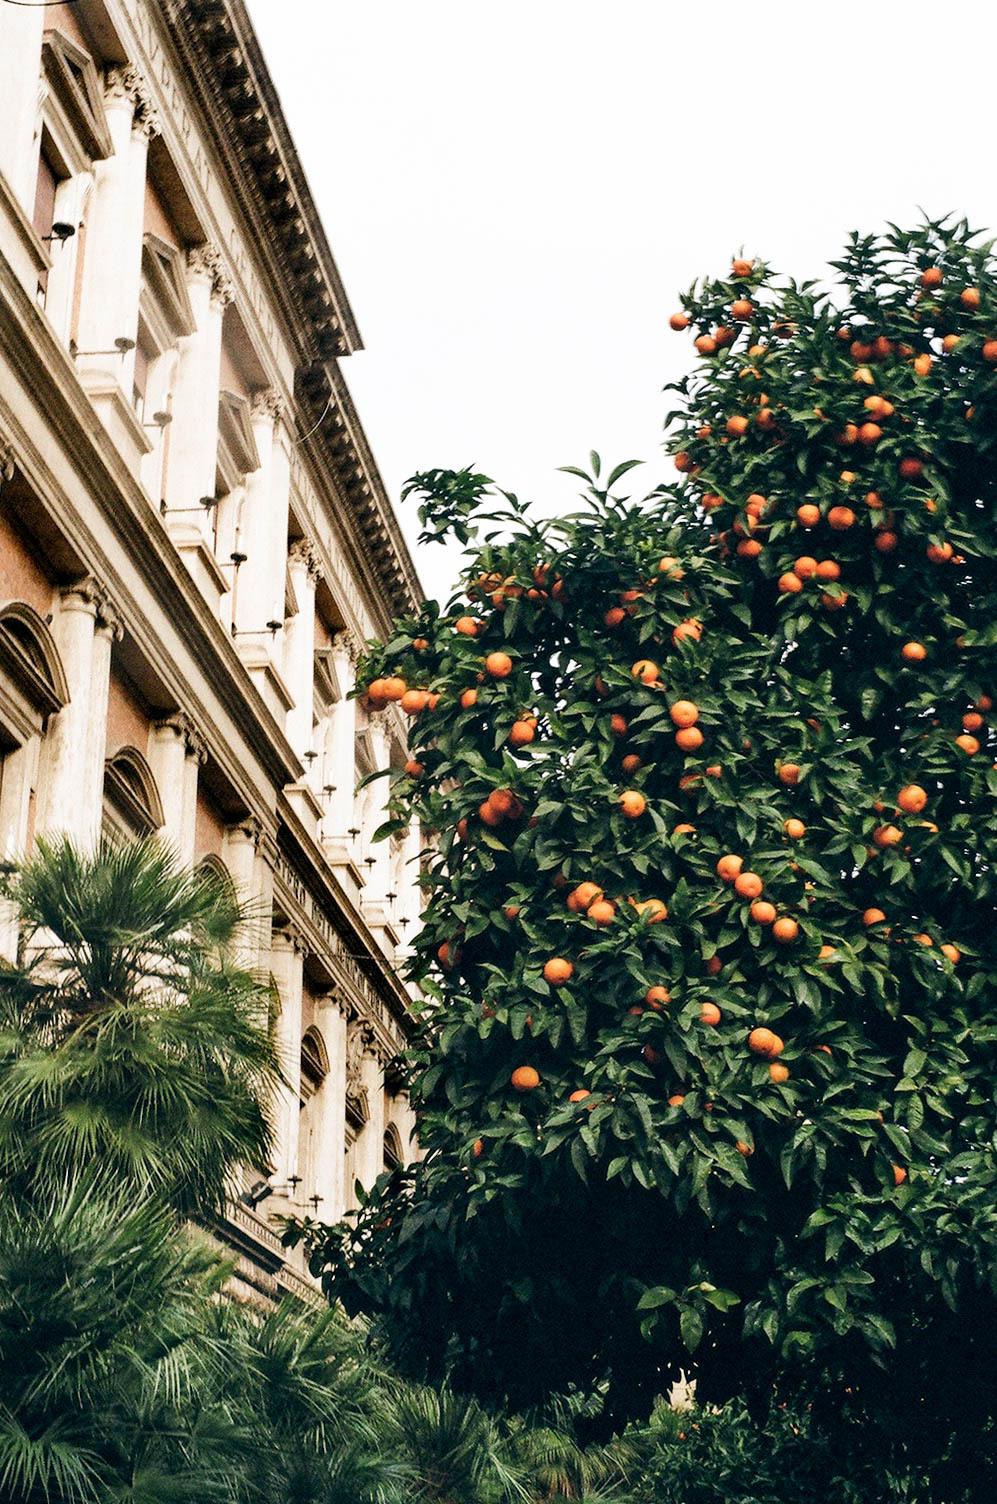 rome, italy via asiadeniseshelton